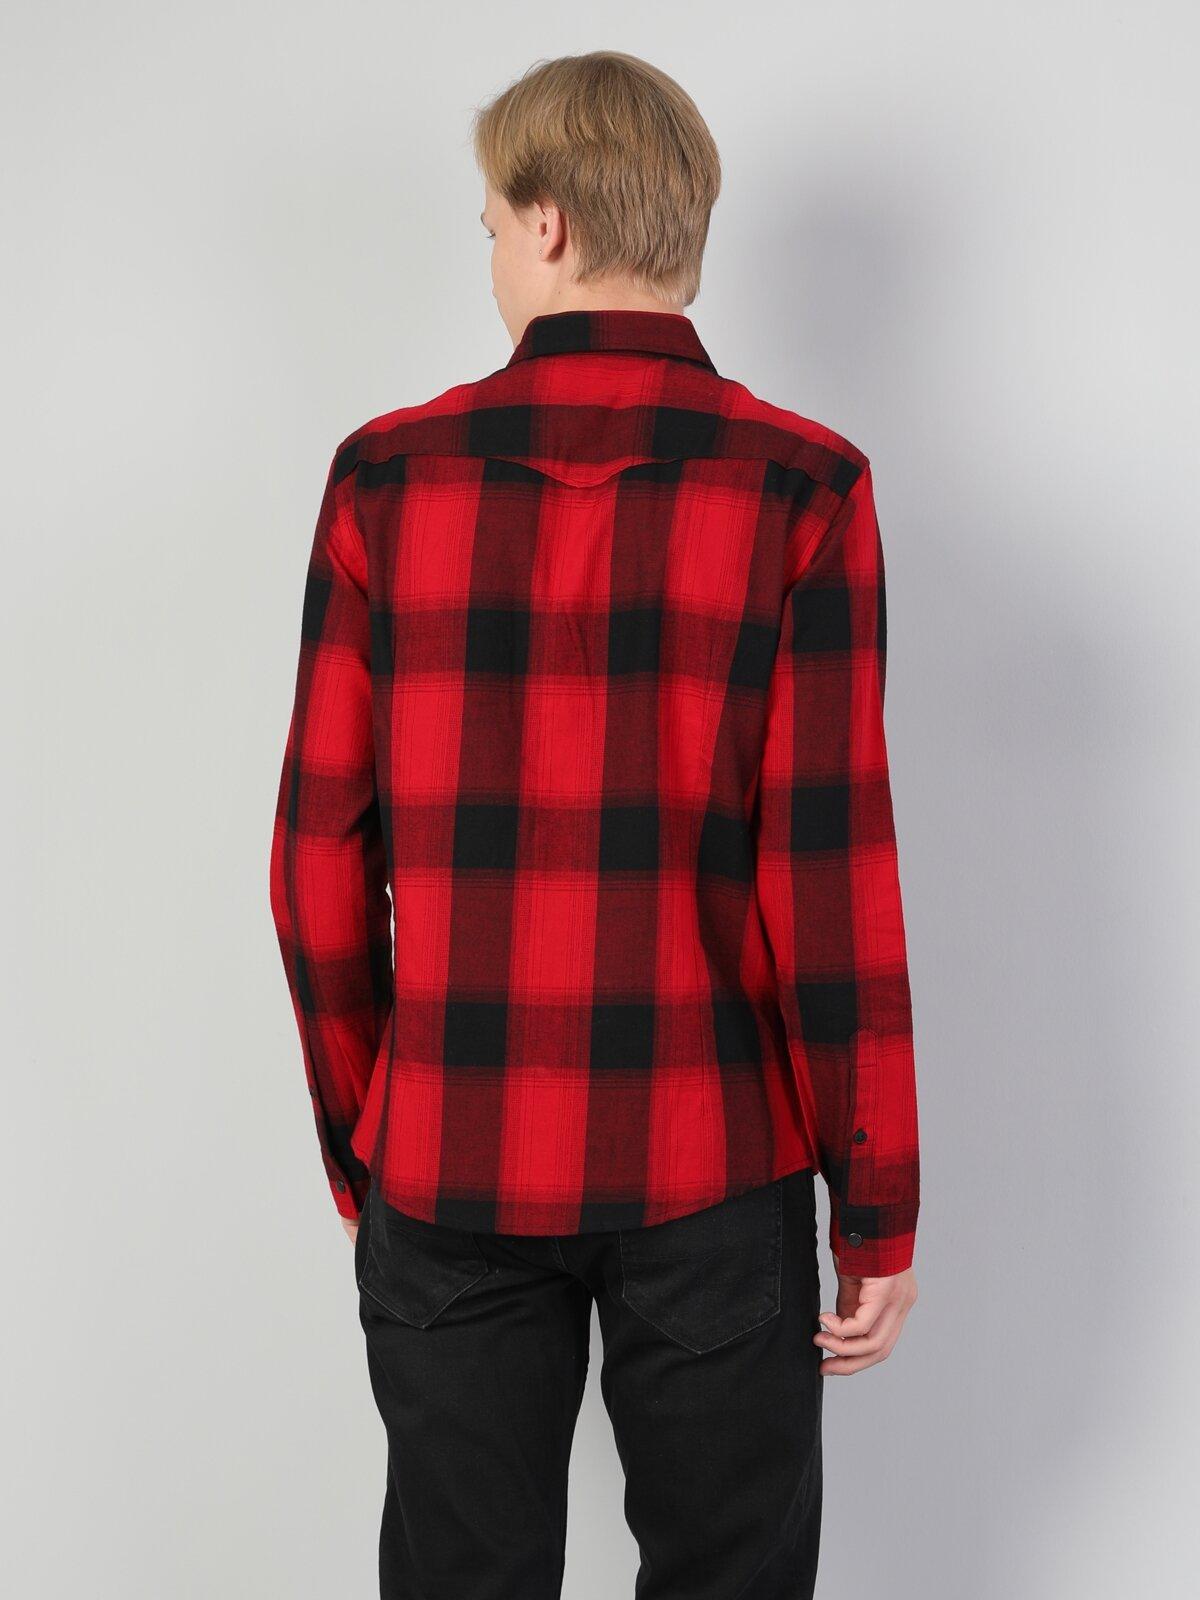 Slim Fit Shirt Neck Erkek Kırmızı Uzun Kol Gömlek